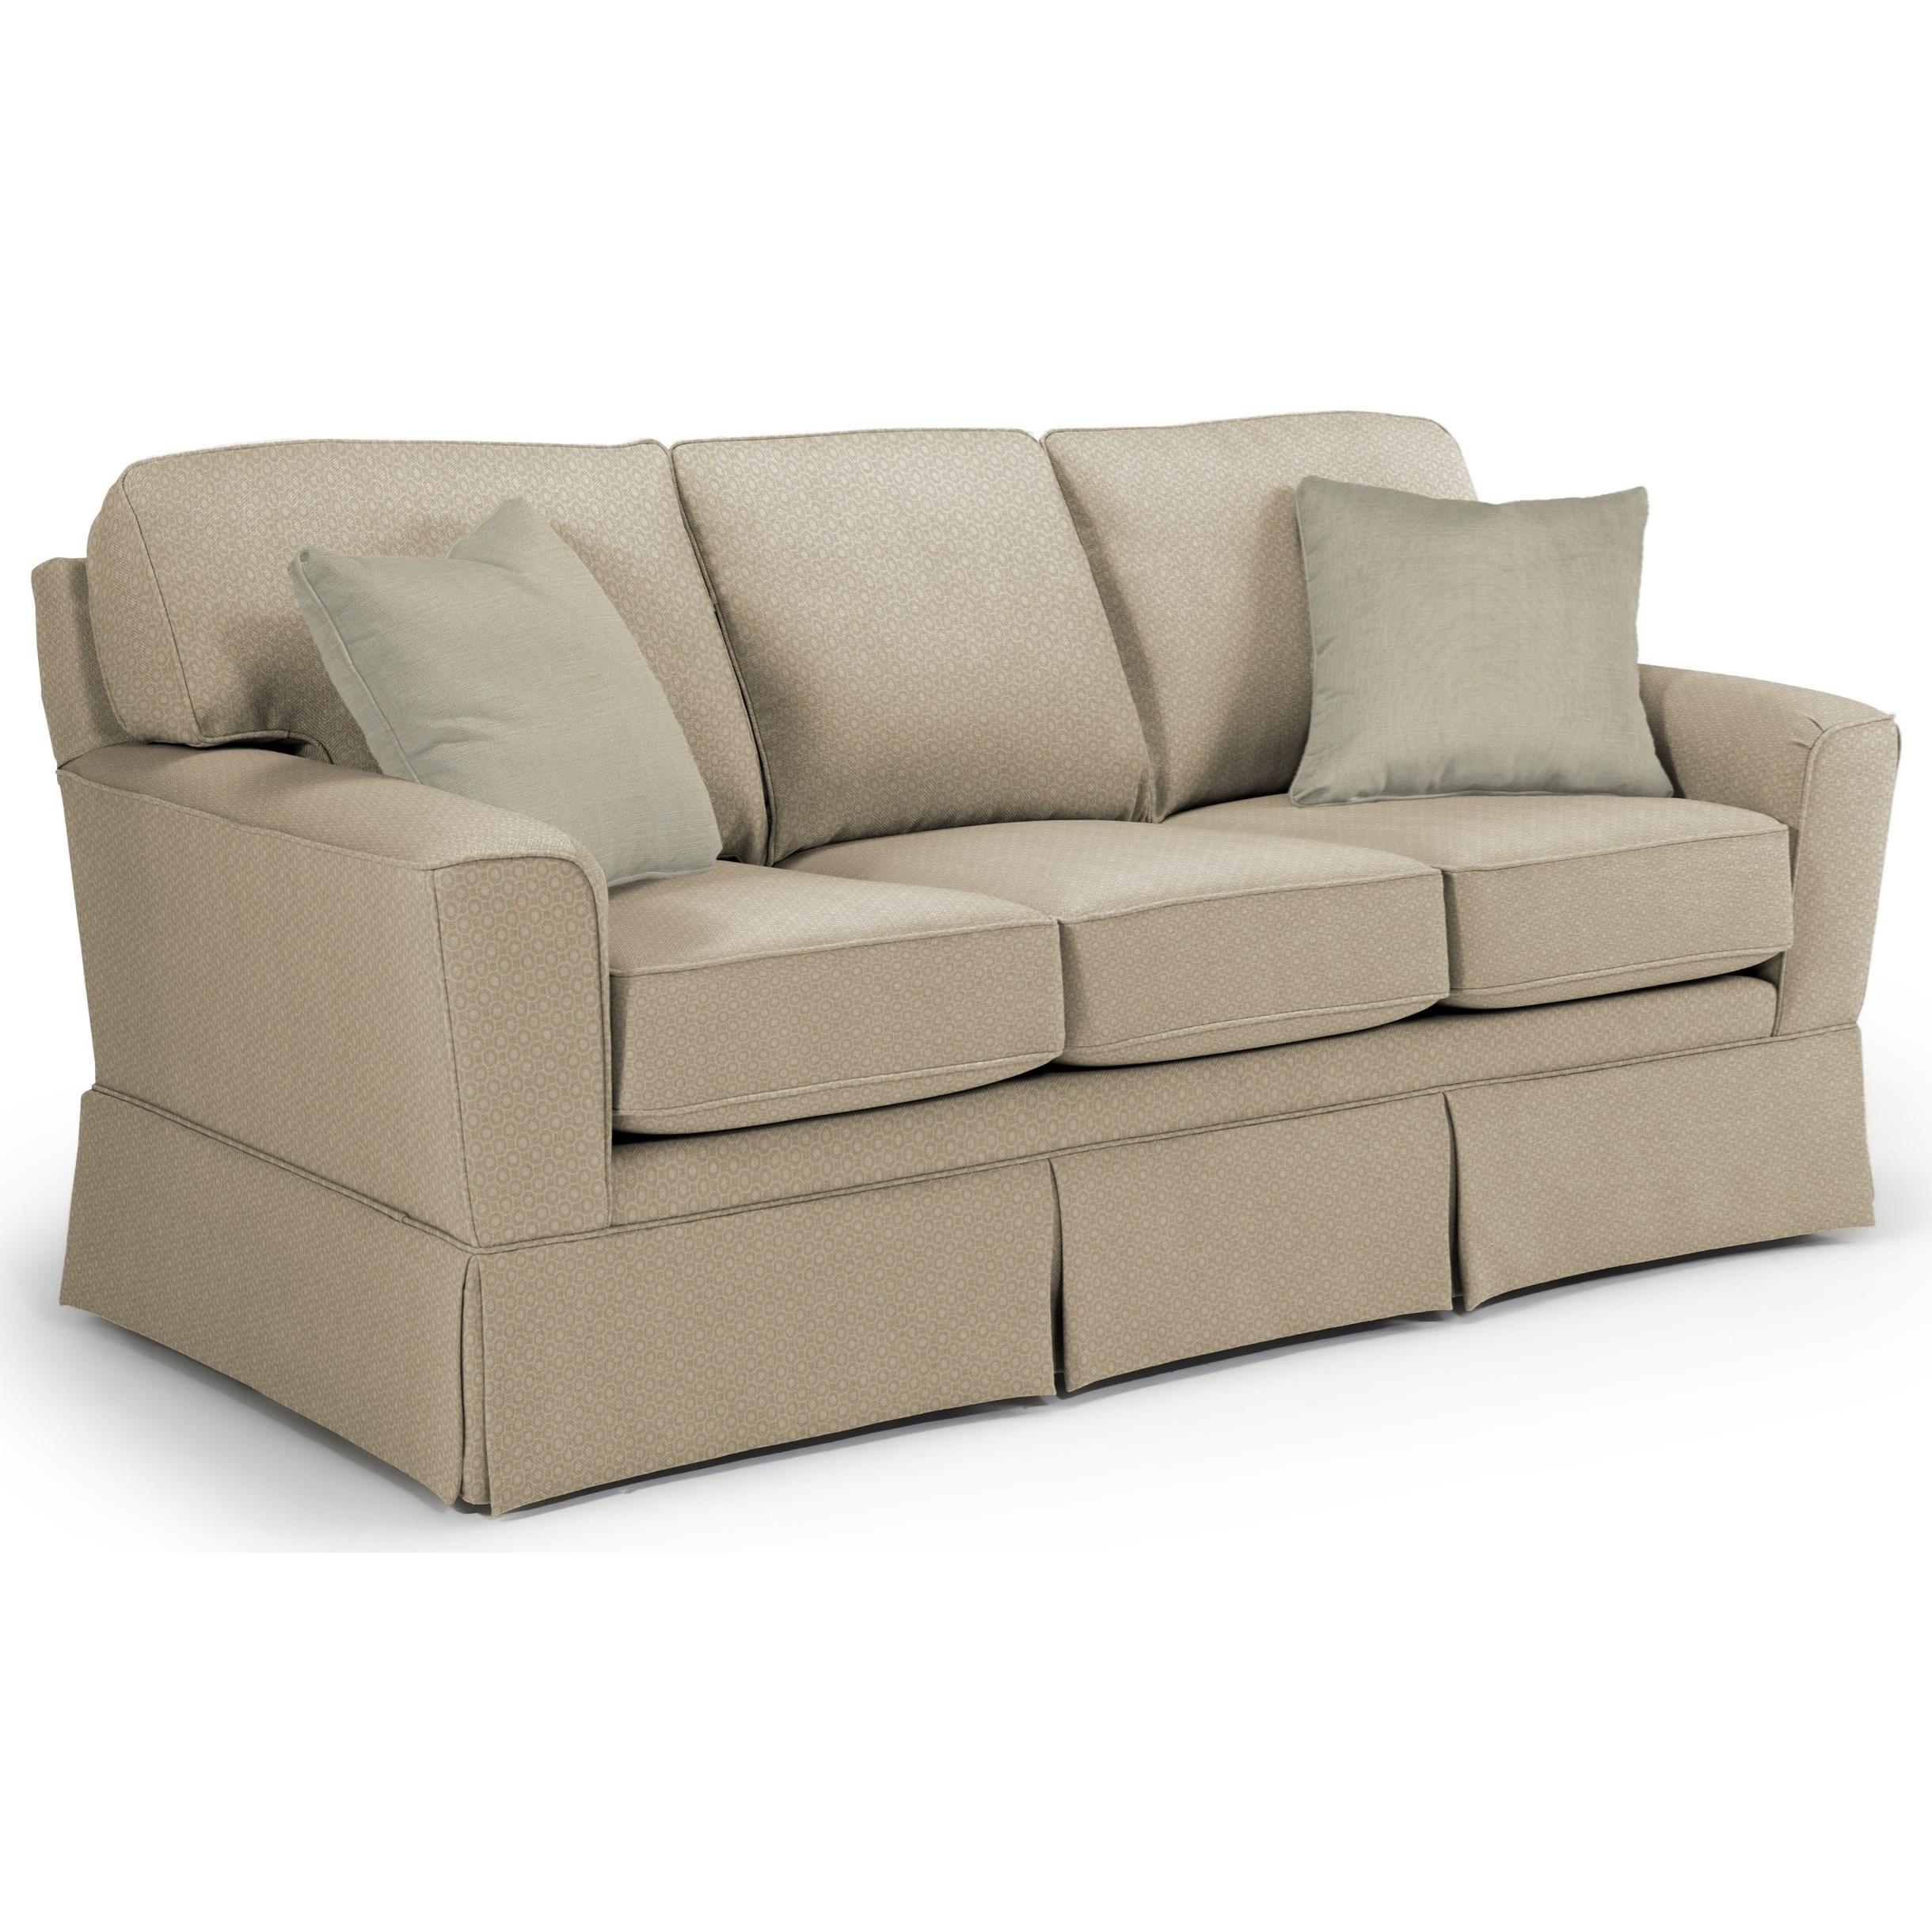 Best Home Furnishings Annabel  <b>Custom</b> 3 Over 3 Sofa - Item Number: -2110035674-28713